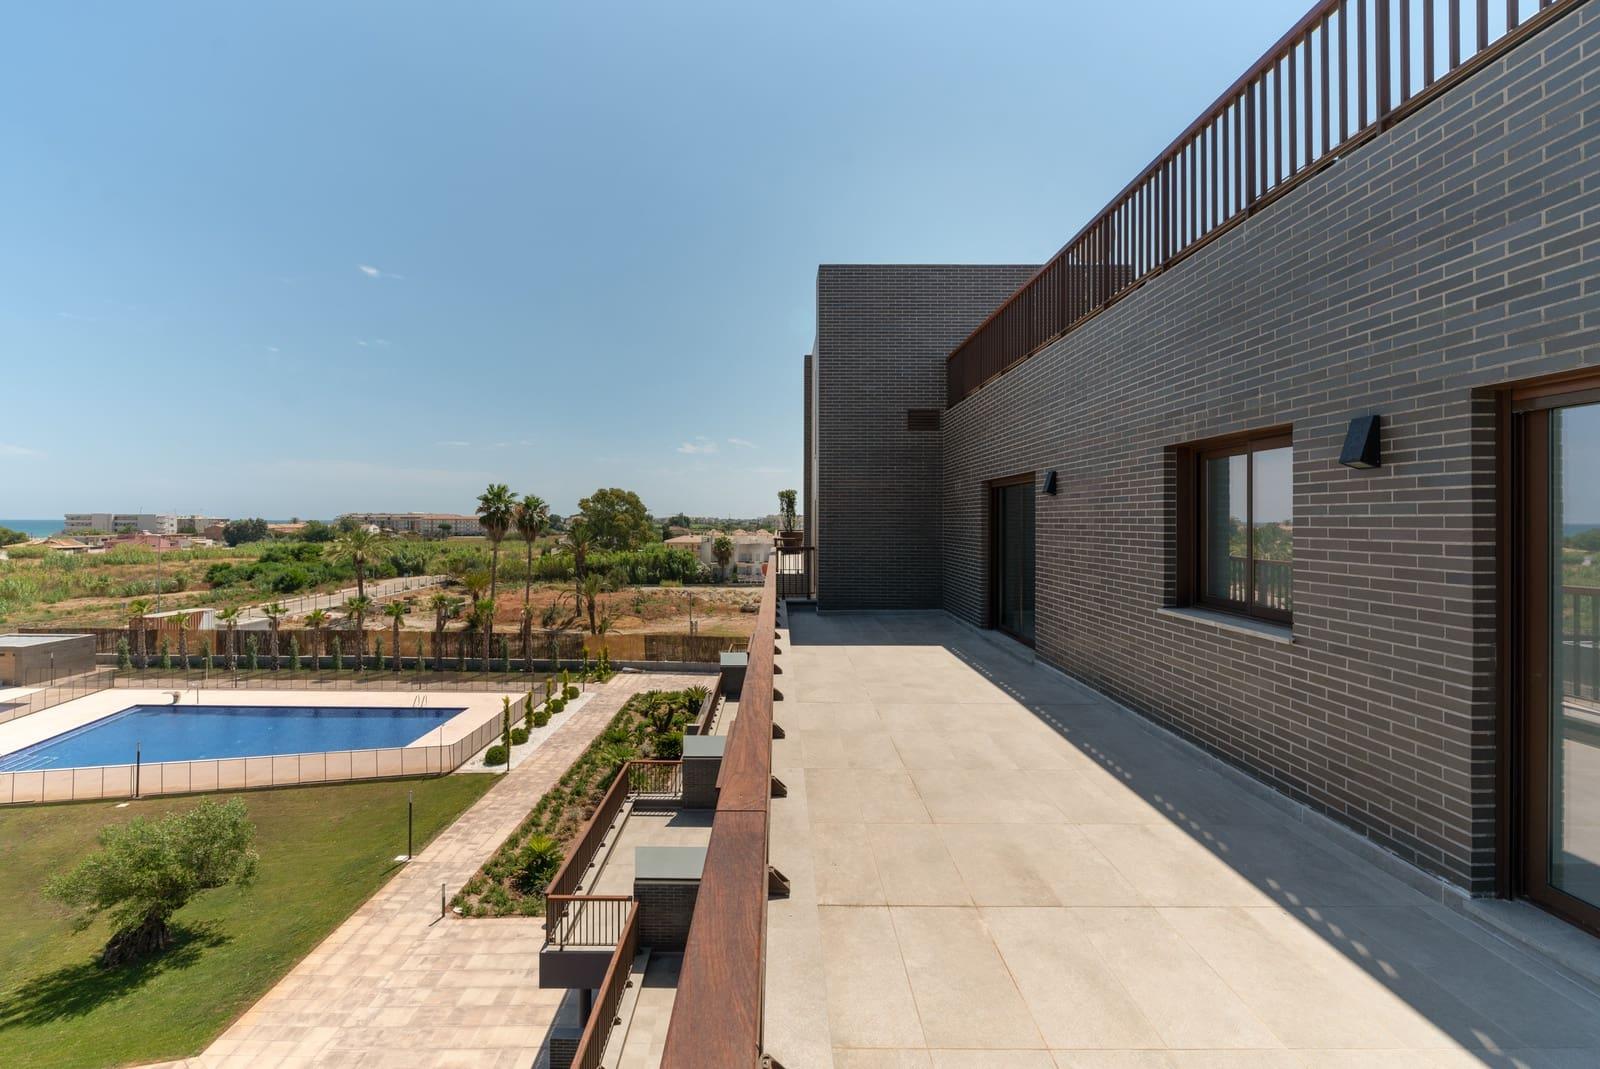 2 bedroom Apartment for sale in Denia - € 164,100 (Ref: 5402767)